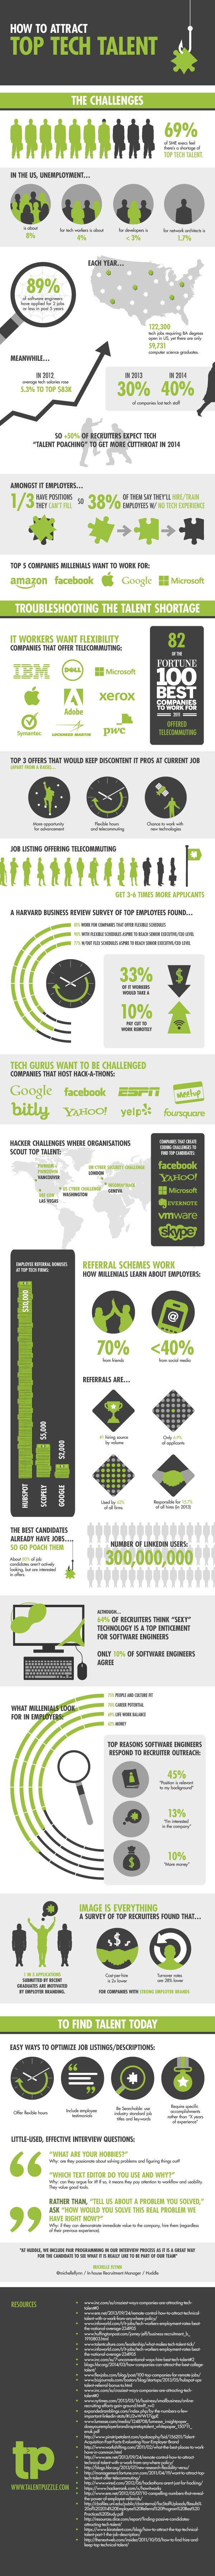 Statistics re: current US job market, recruitment strategies & hiring at tech firms via @Mashable | #infographic